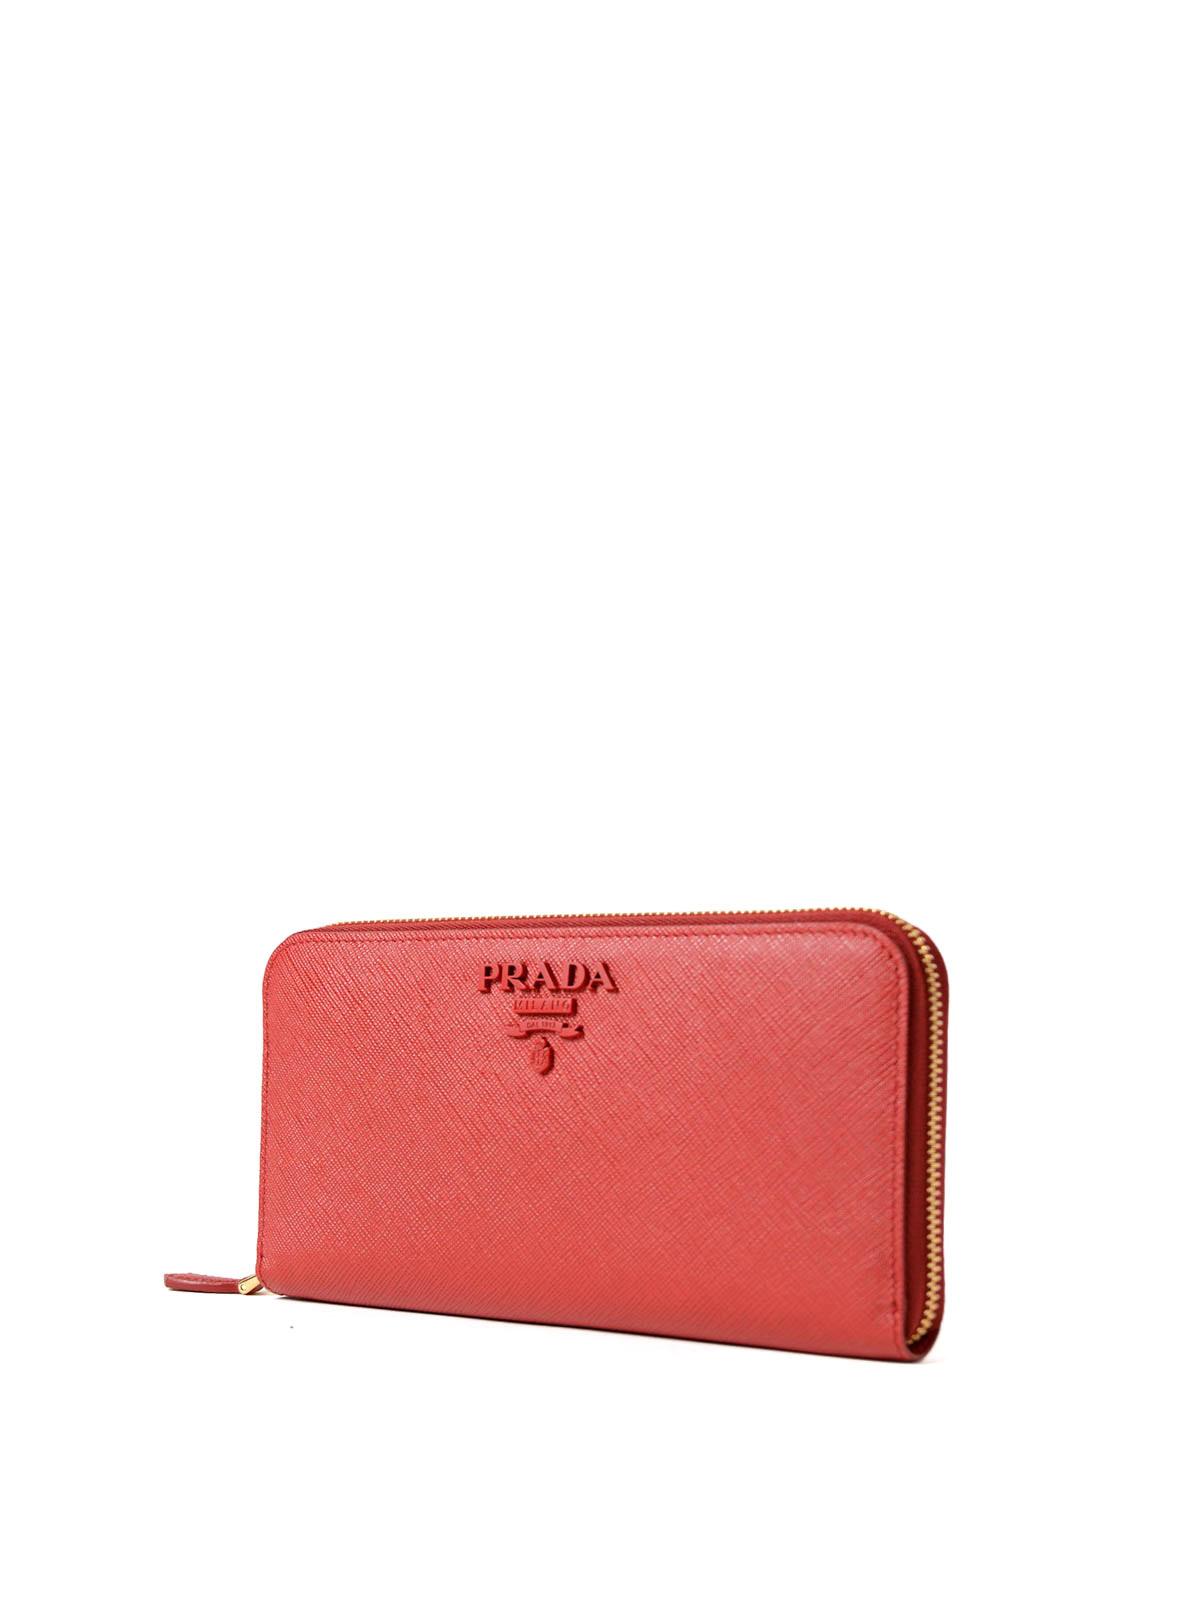 7e6d6e10ccd PRADA  wallets   purses online - Red saffiano zip-around wallet